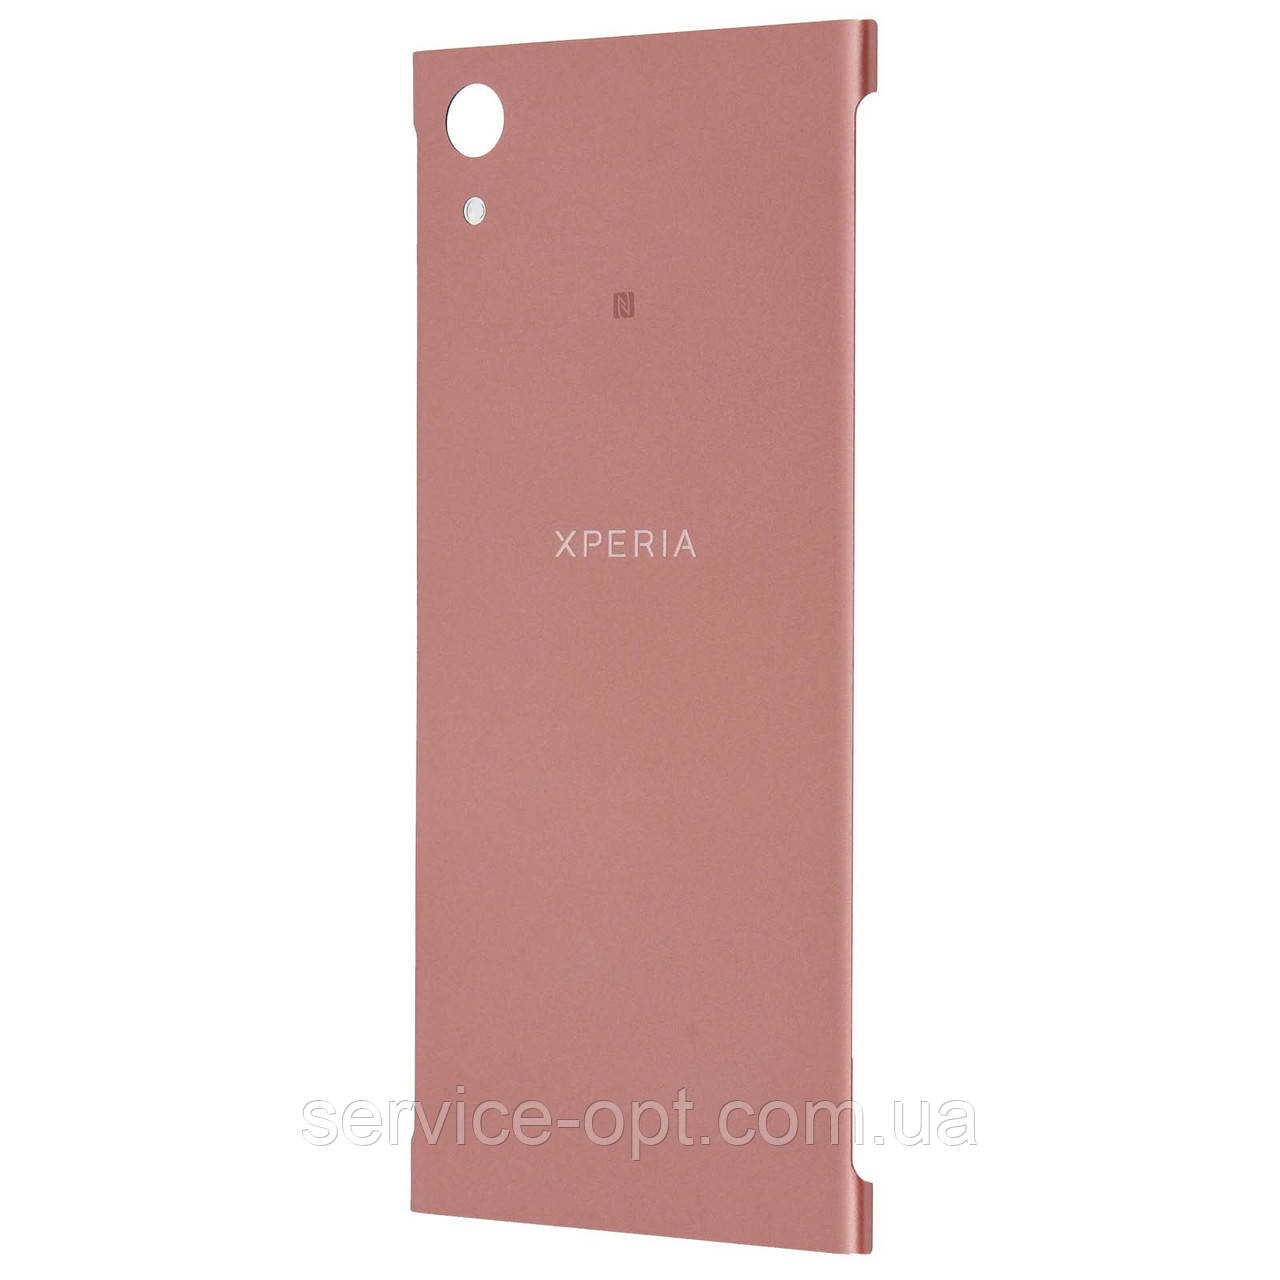 Задняя крышка Sony G3112 Xperia XA1 Dual, G3116, G3121, G3125, розовая,